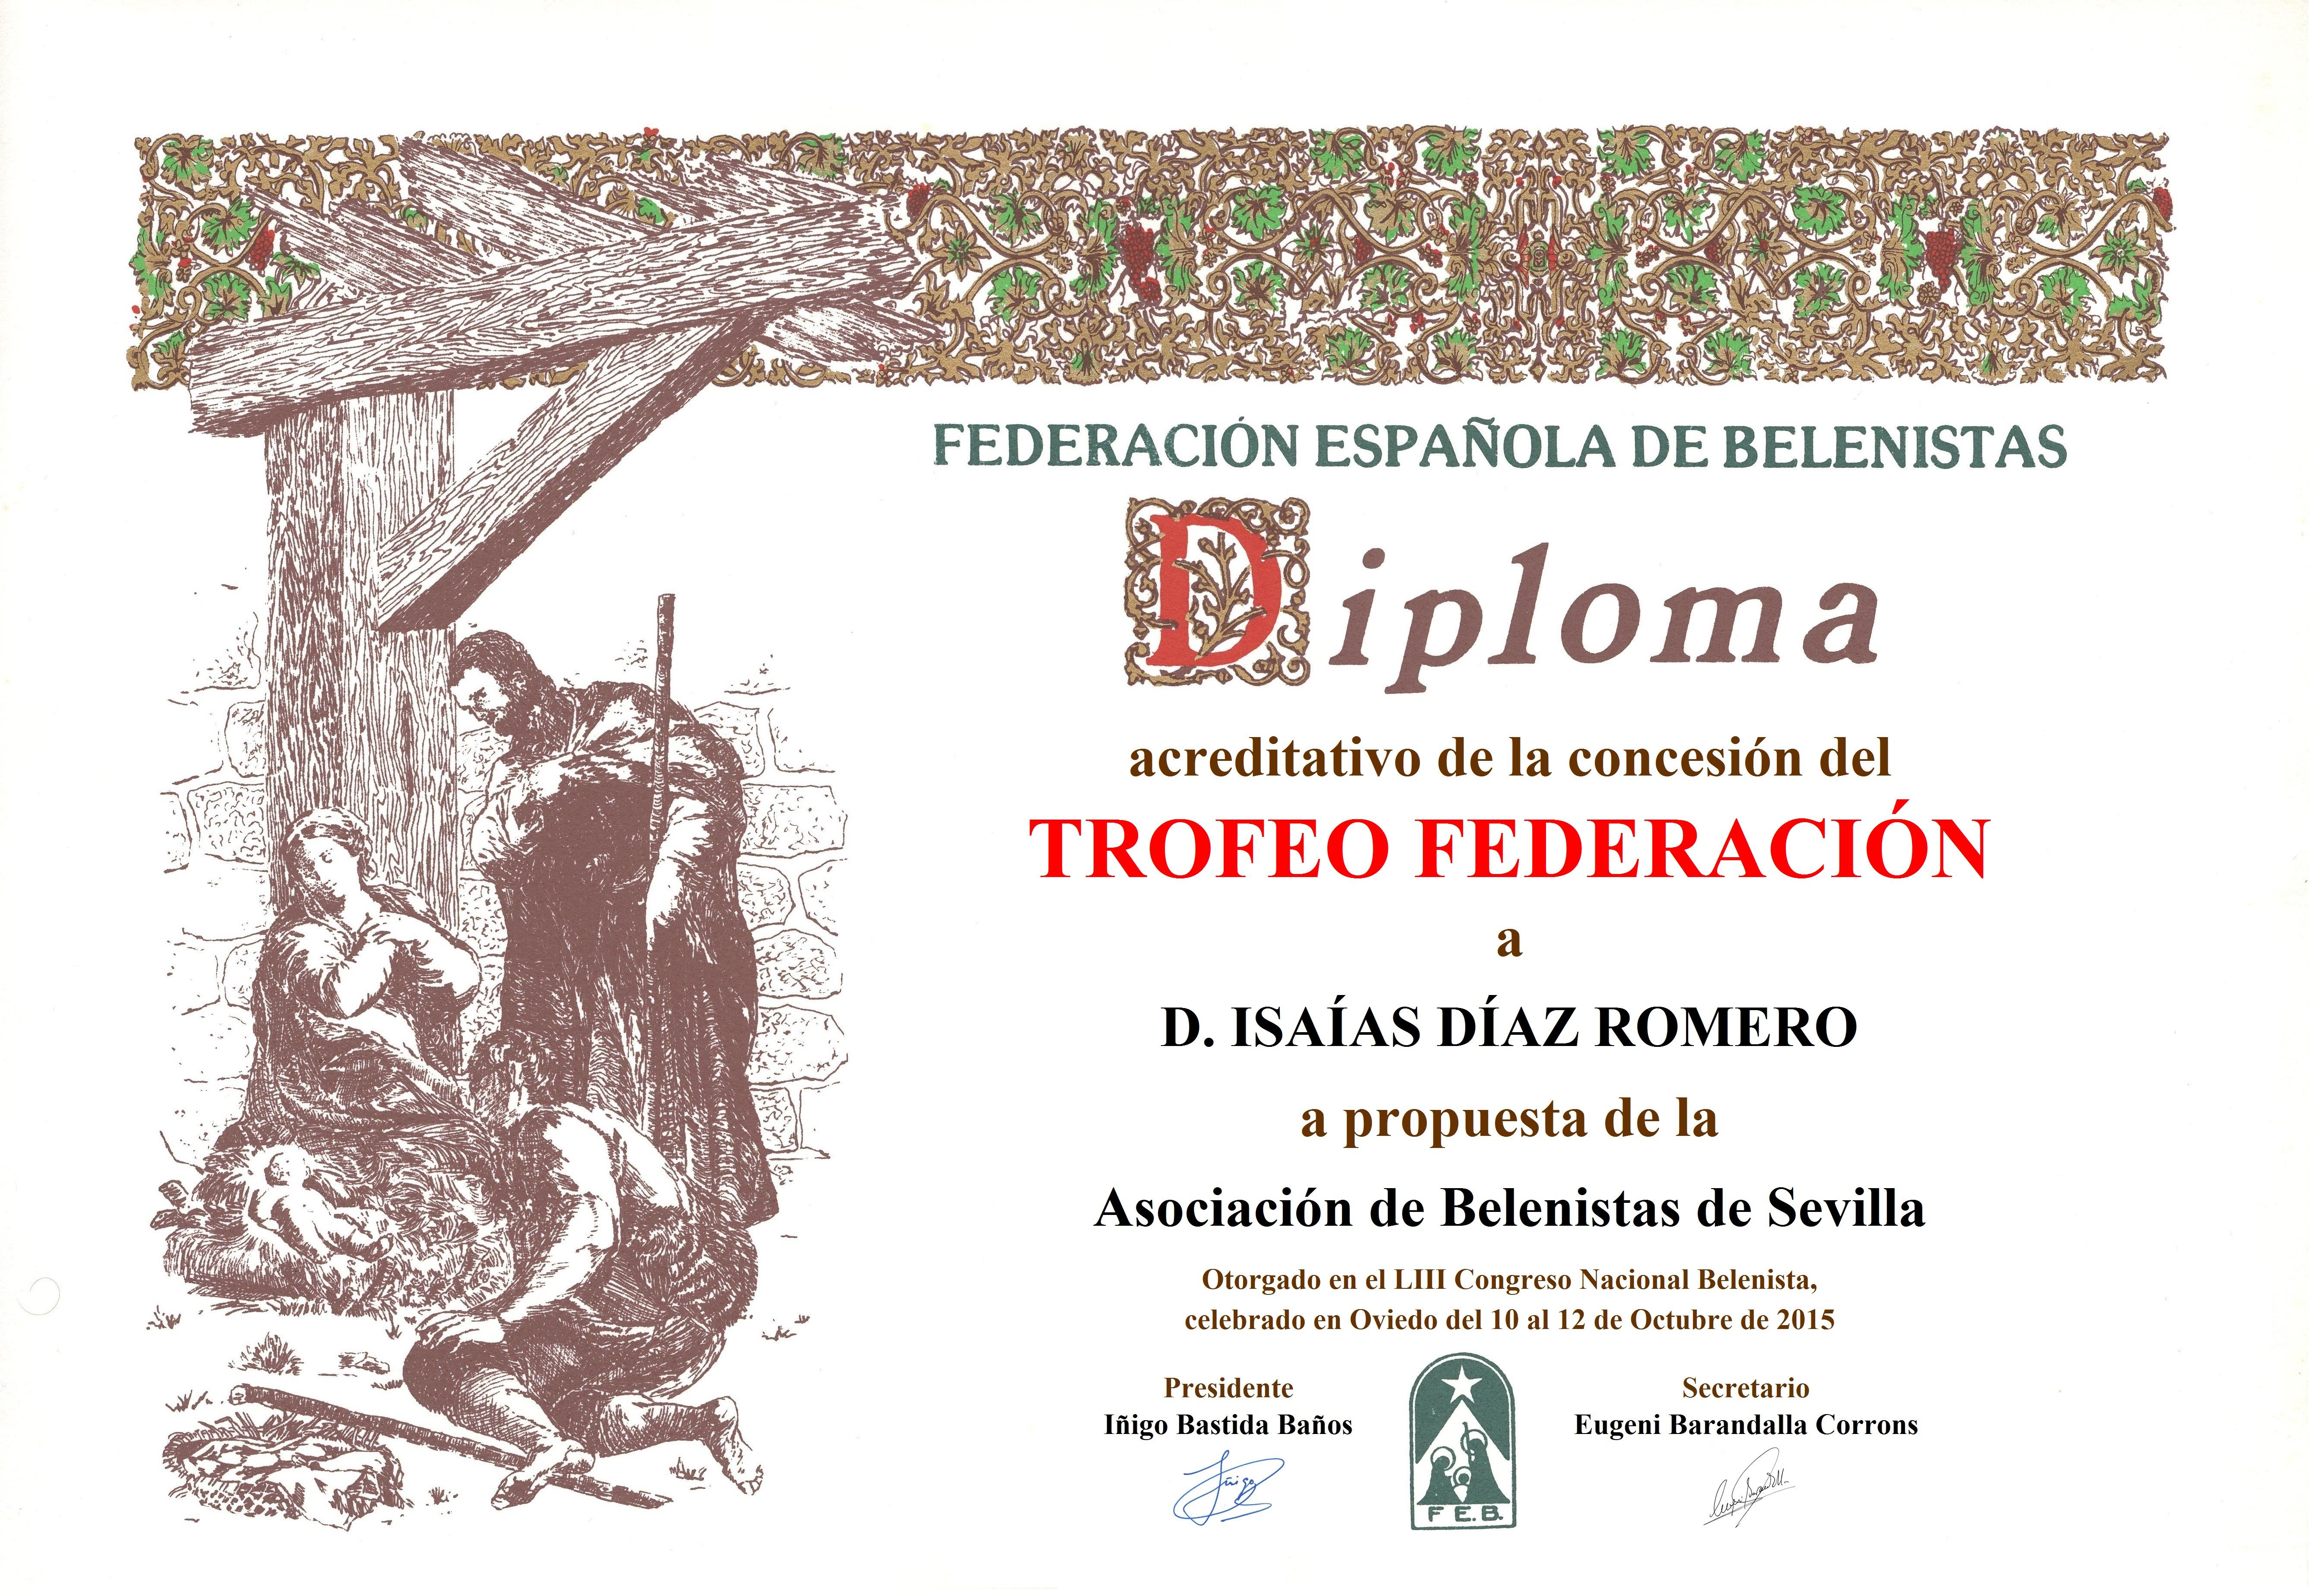 Diploma Trofeo FEB 2015 Isaías Díaz Romero